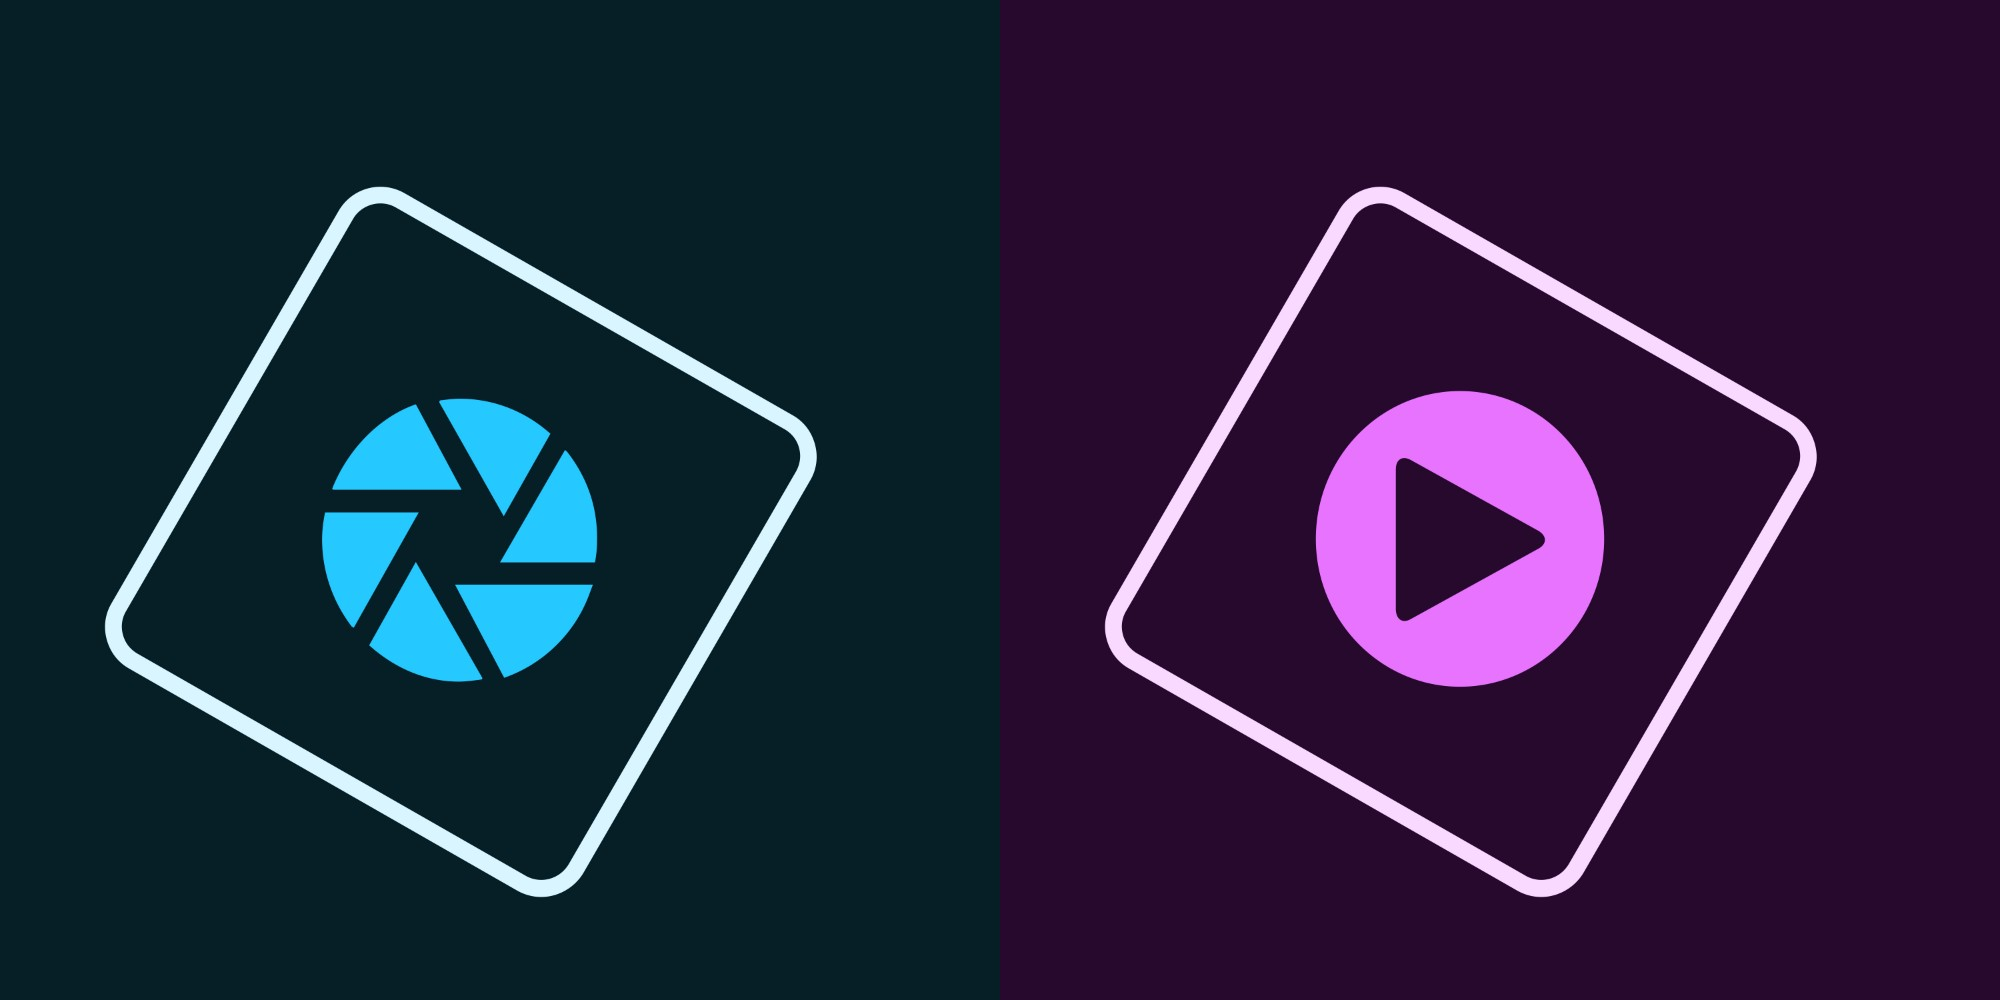 Adobe Photoshop Elements 2021 & Premiere Elements 2021 Mac 1 license(s)